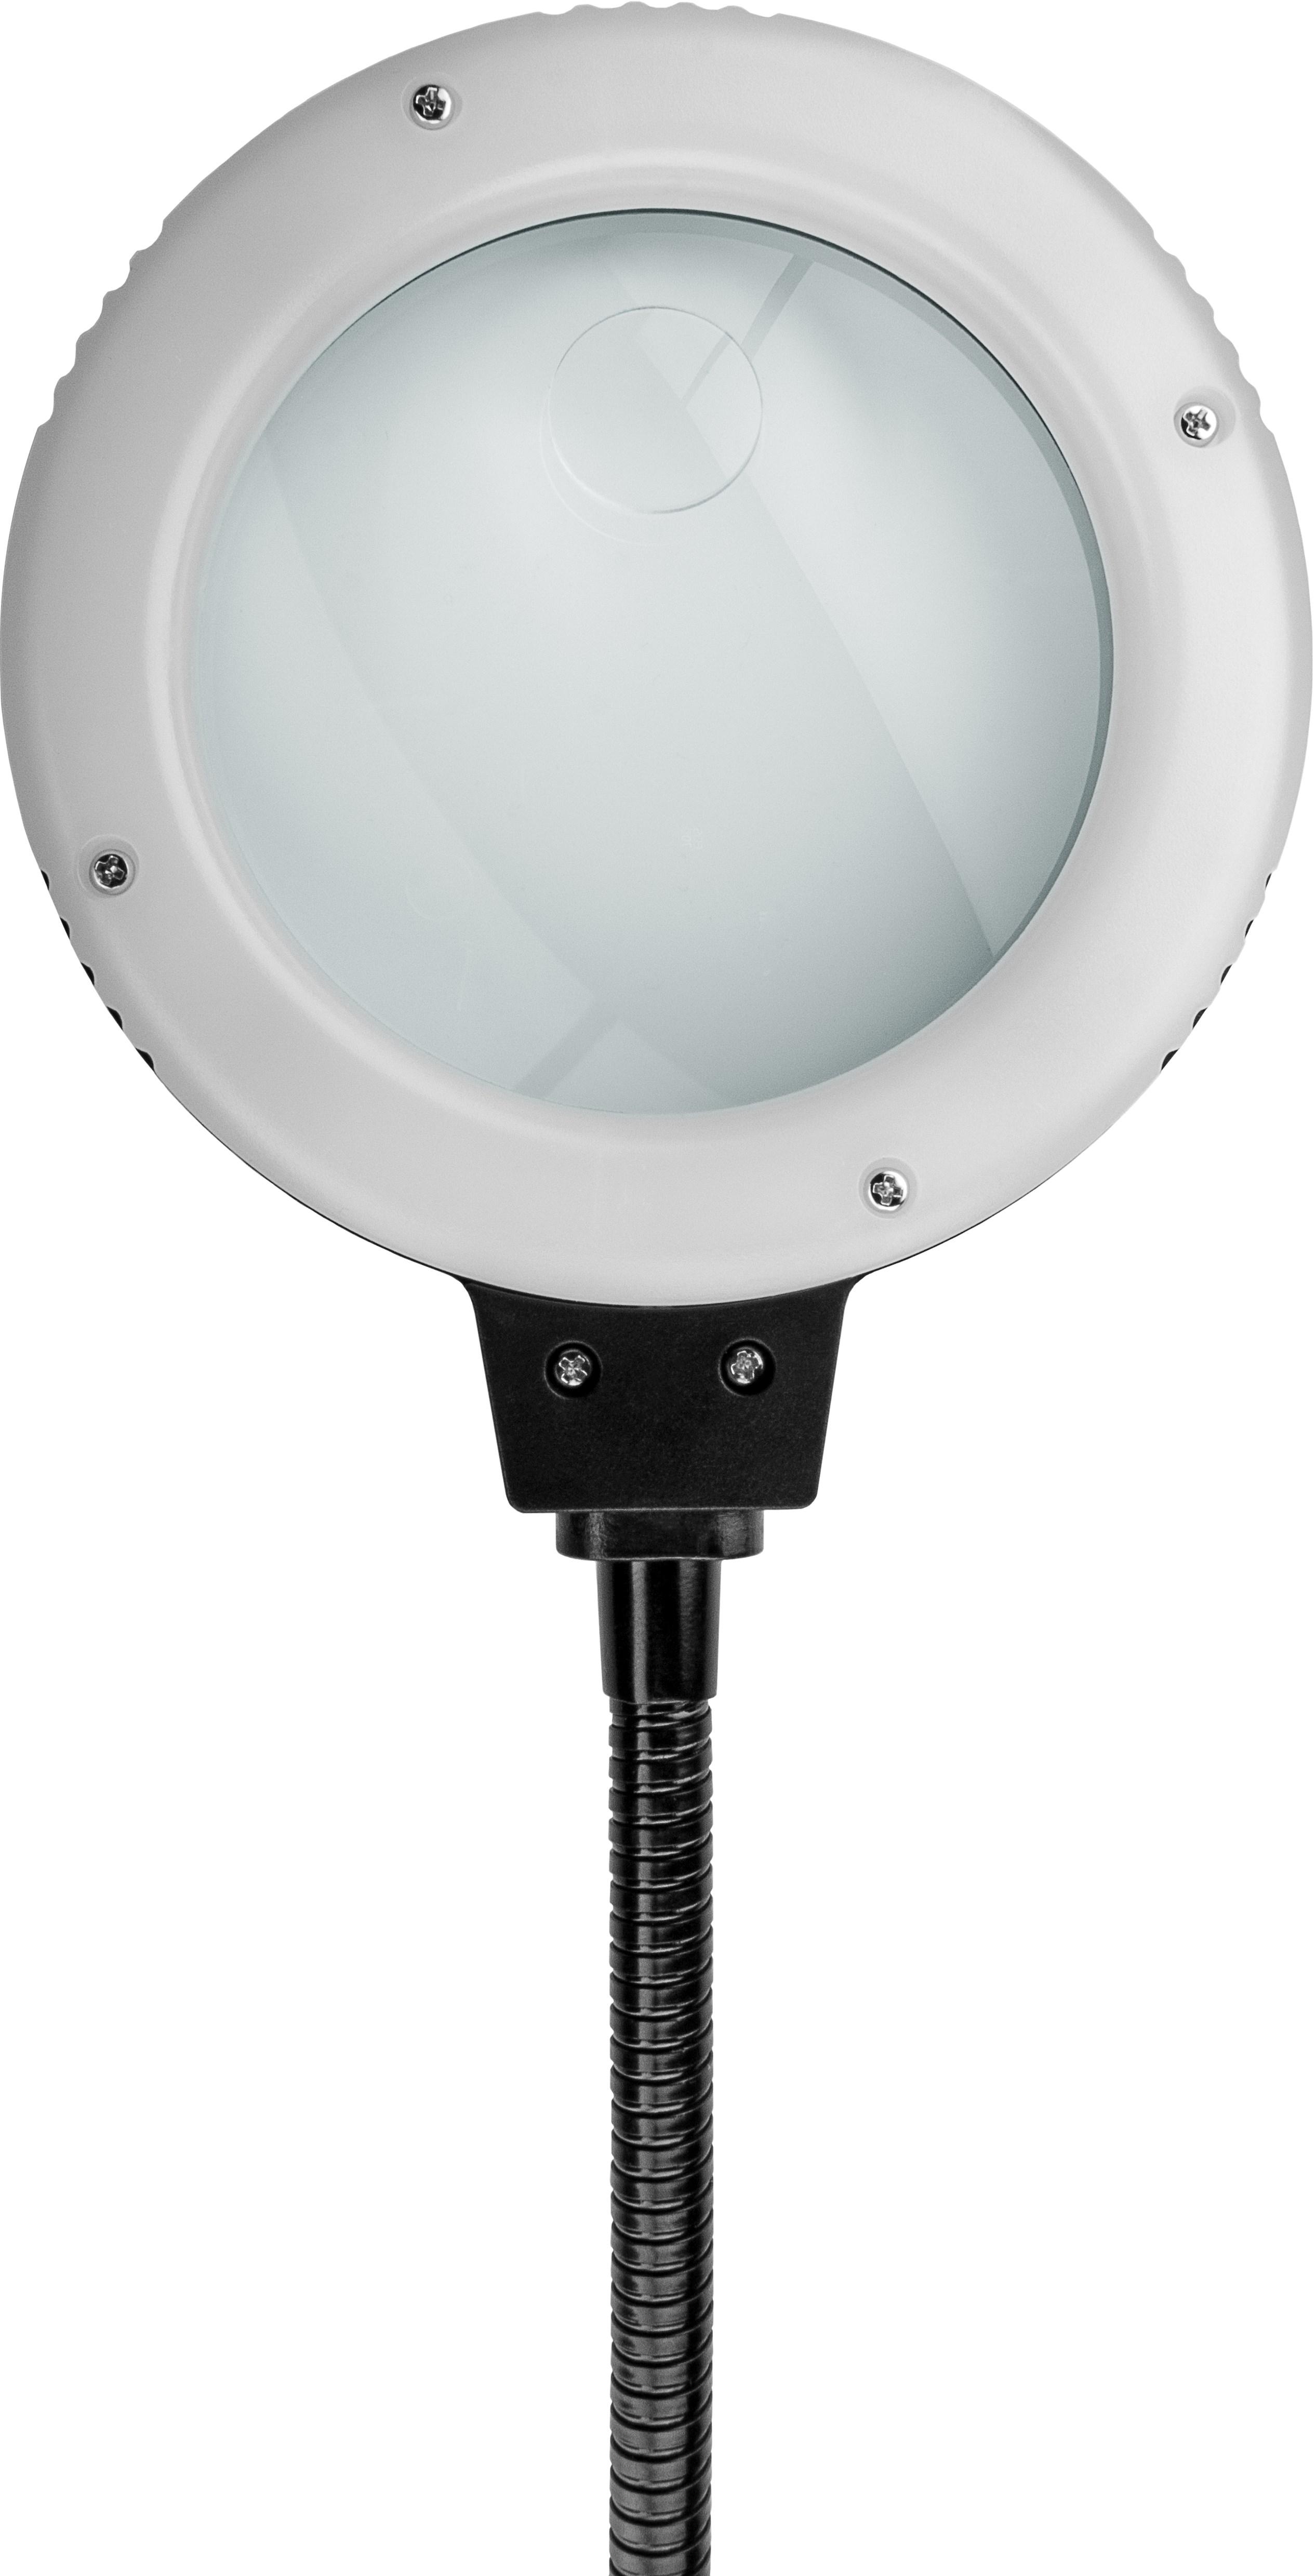 Löthilfe mit LED-Lampe Schwanenhals-Krokodilklemme Lupe mit LED Lampe